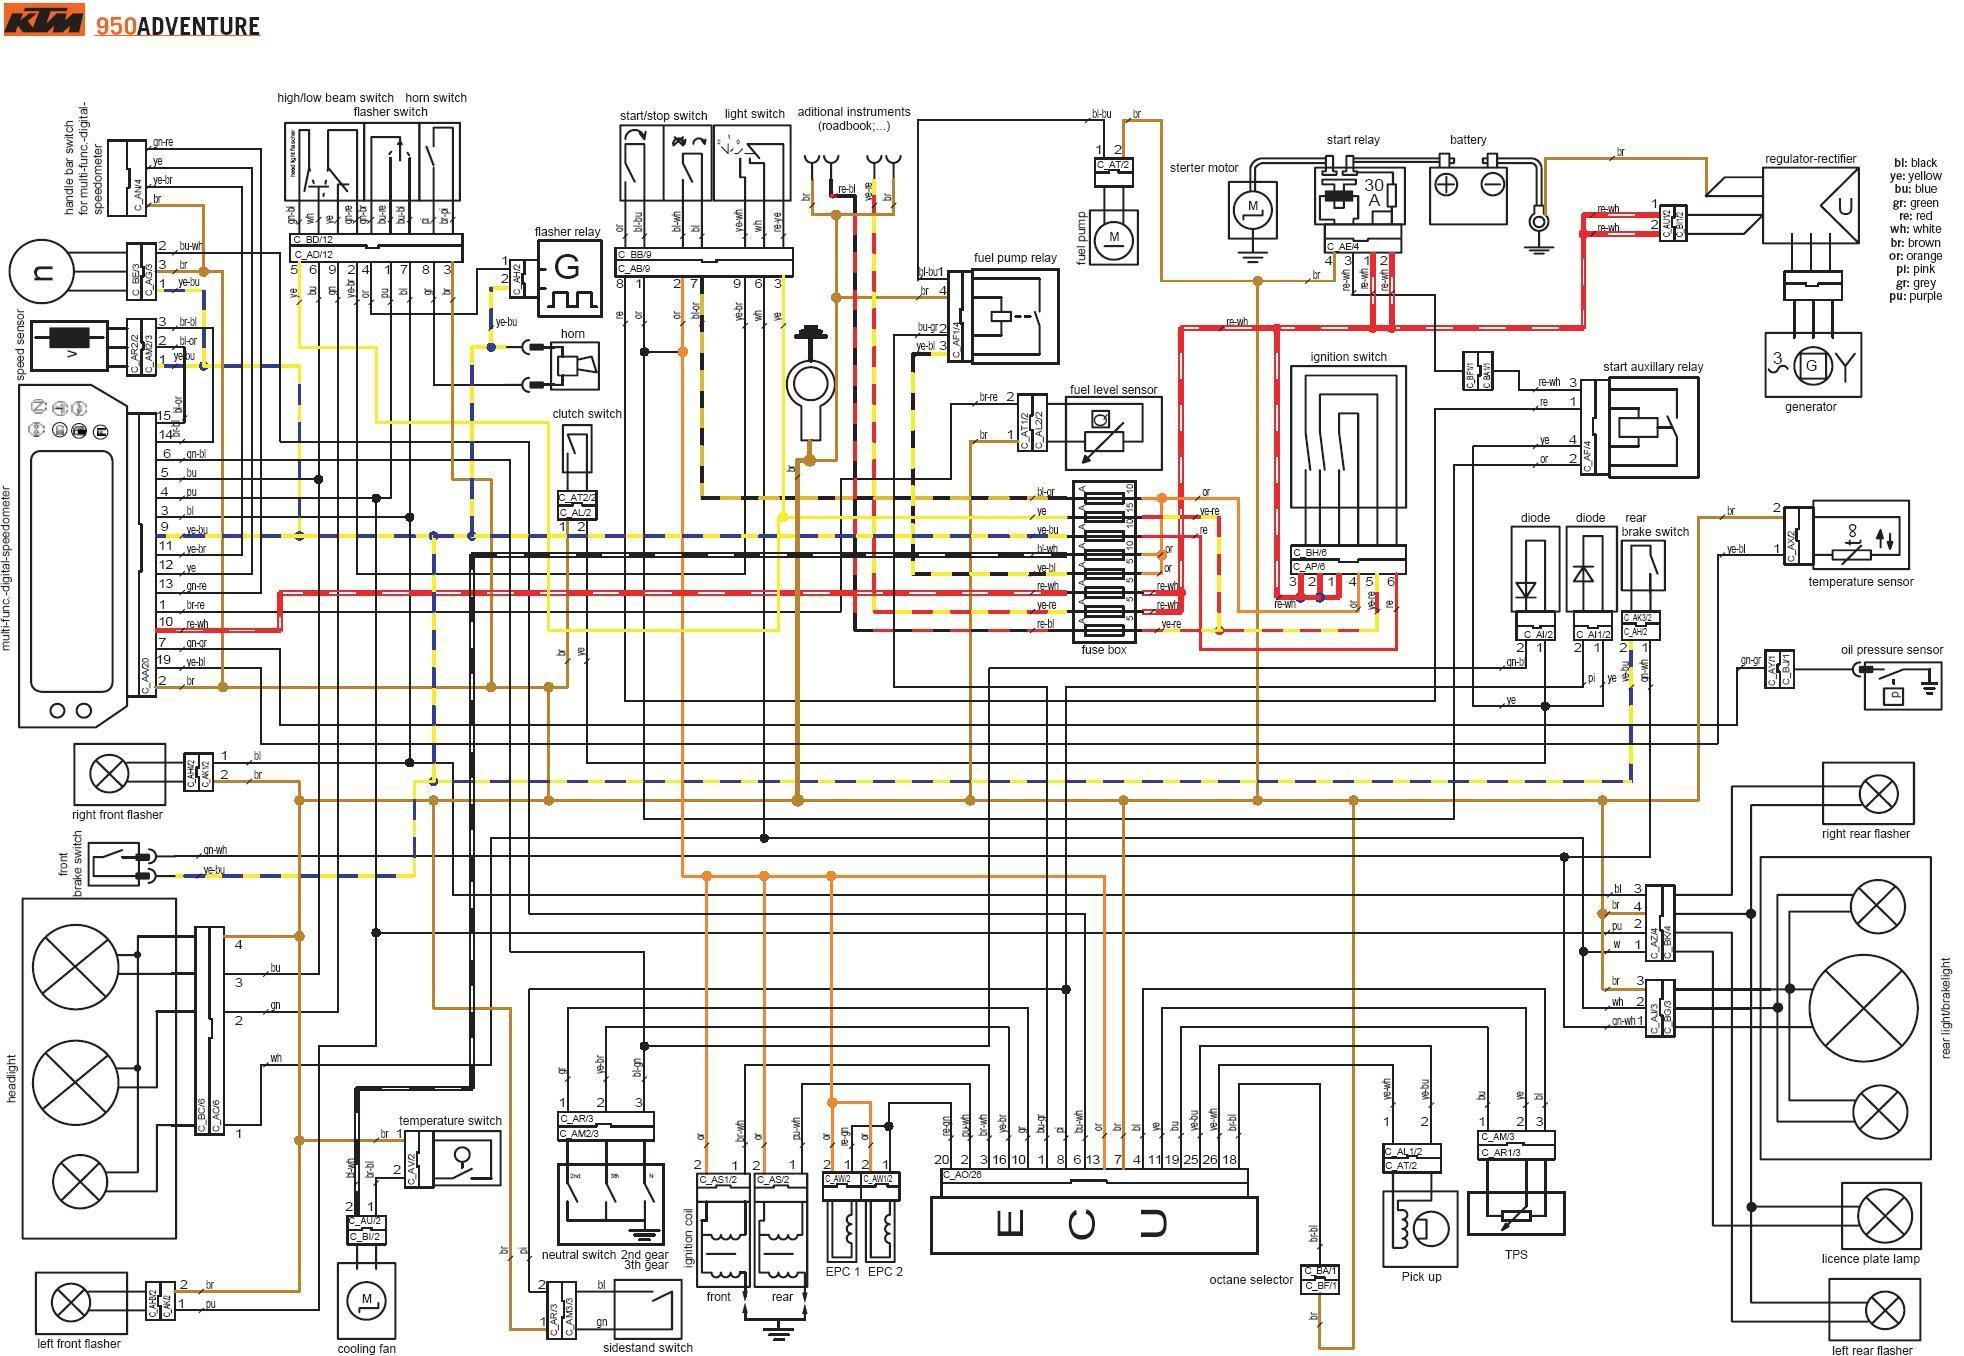 Fantastic Ktm 690 Wire Diagram Wiring Schematic Diagram Demo Beamsys Co Wiring Cloud Staixaidewilluminateatxorg